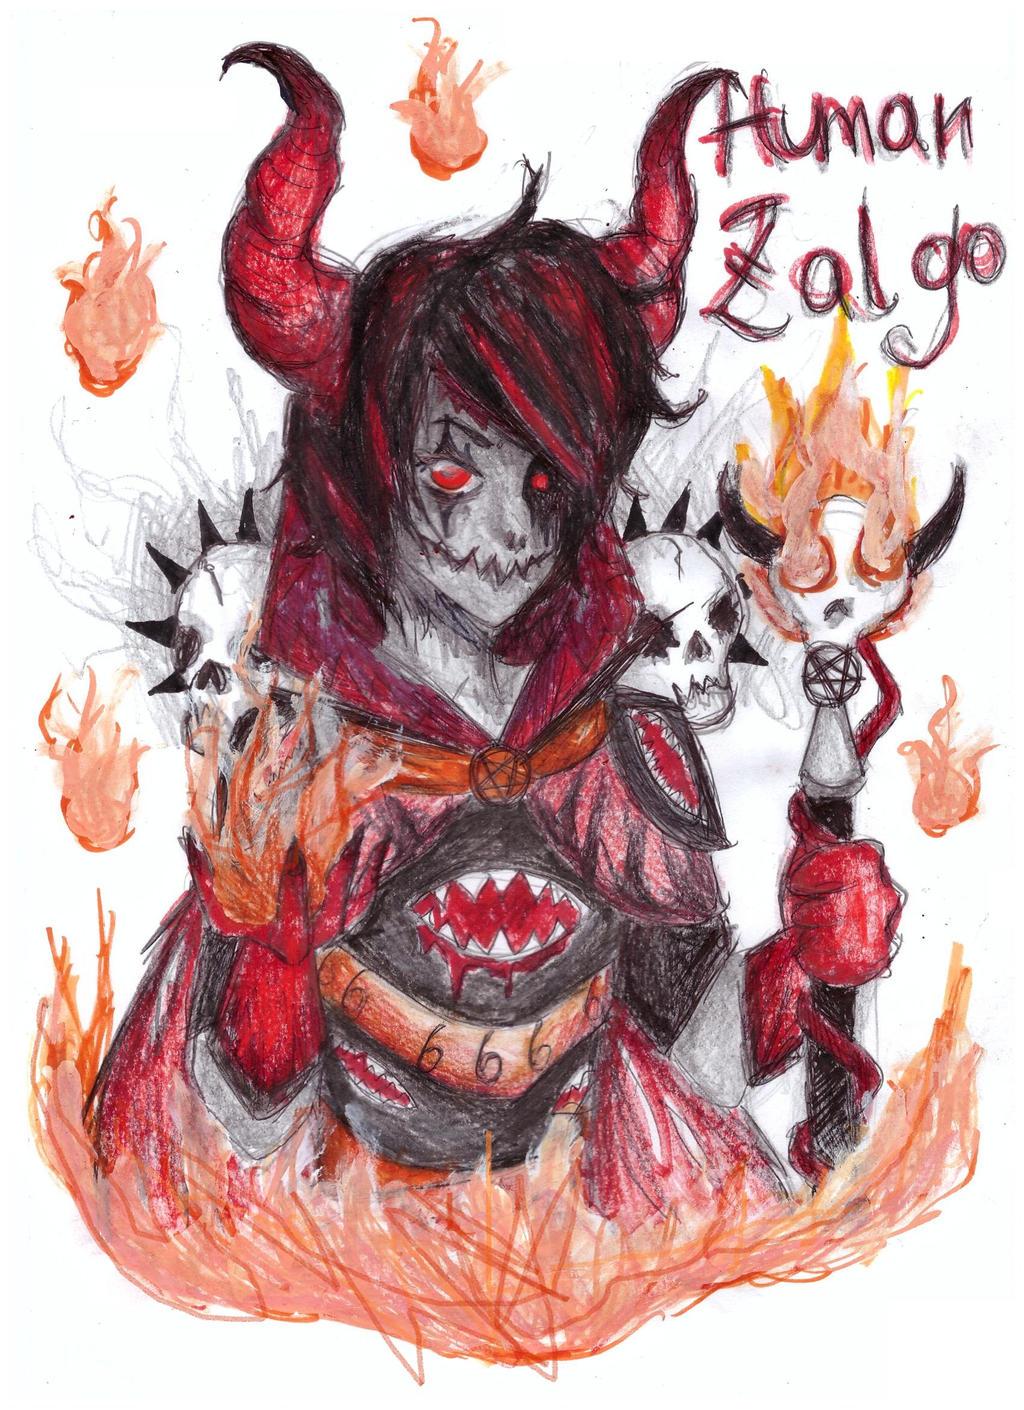 zalgo human form by NENEBUBBLEELOVER on DeviantArt